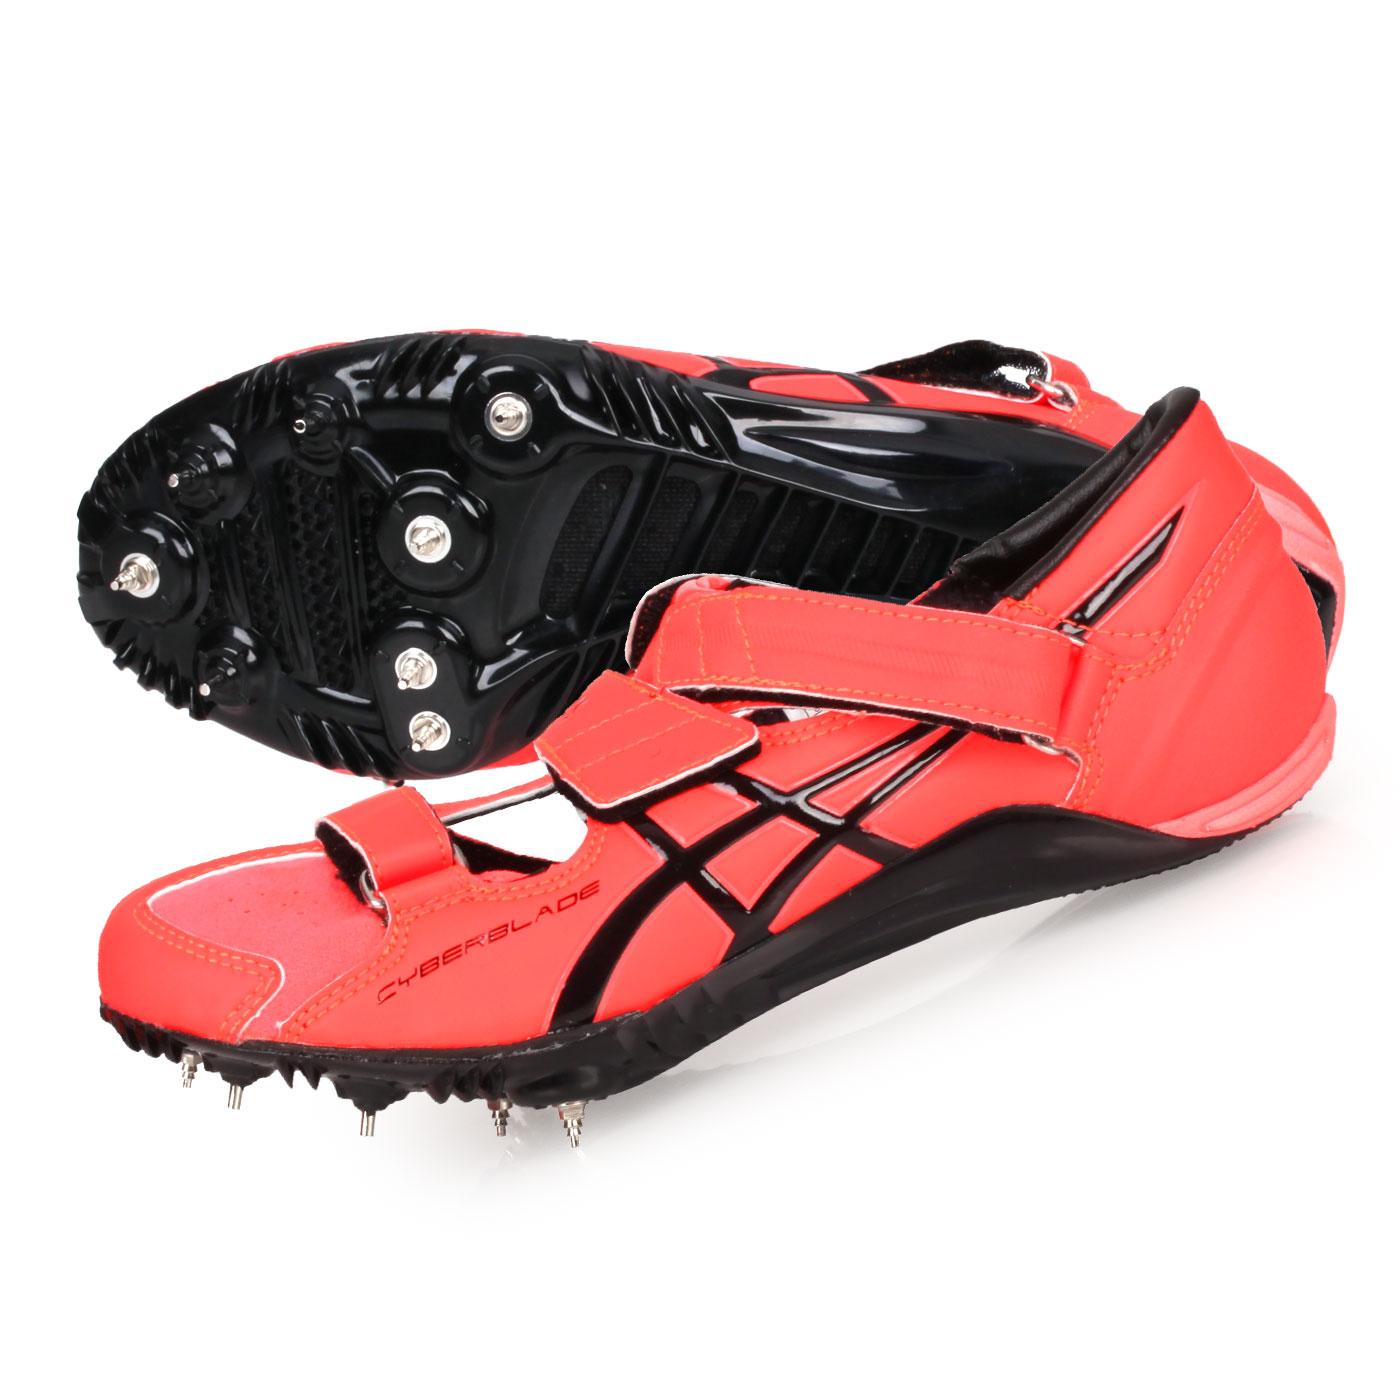 ASICS 日製田徑釘鞋(短距離)  @CYBERBLADE HF@TTP507-701 - 螢光橘黑